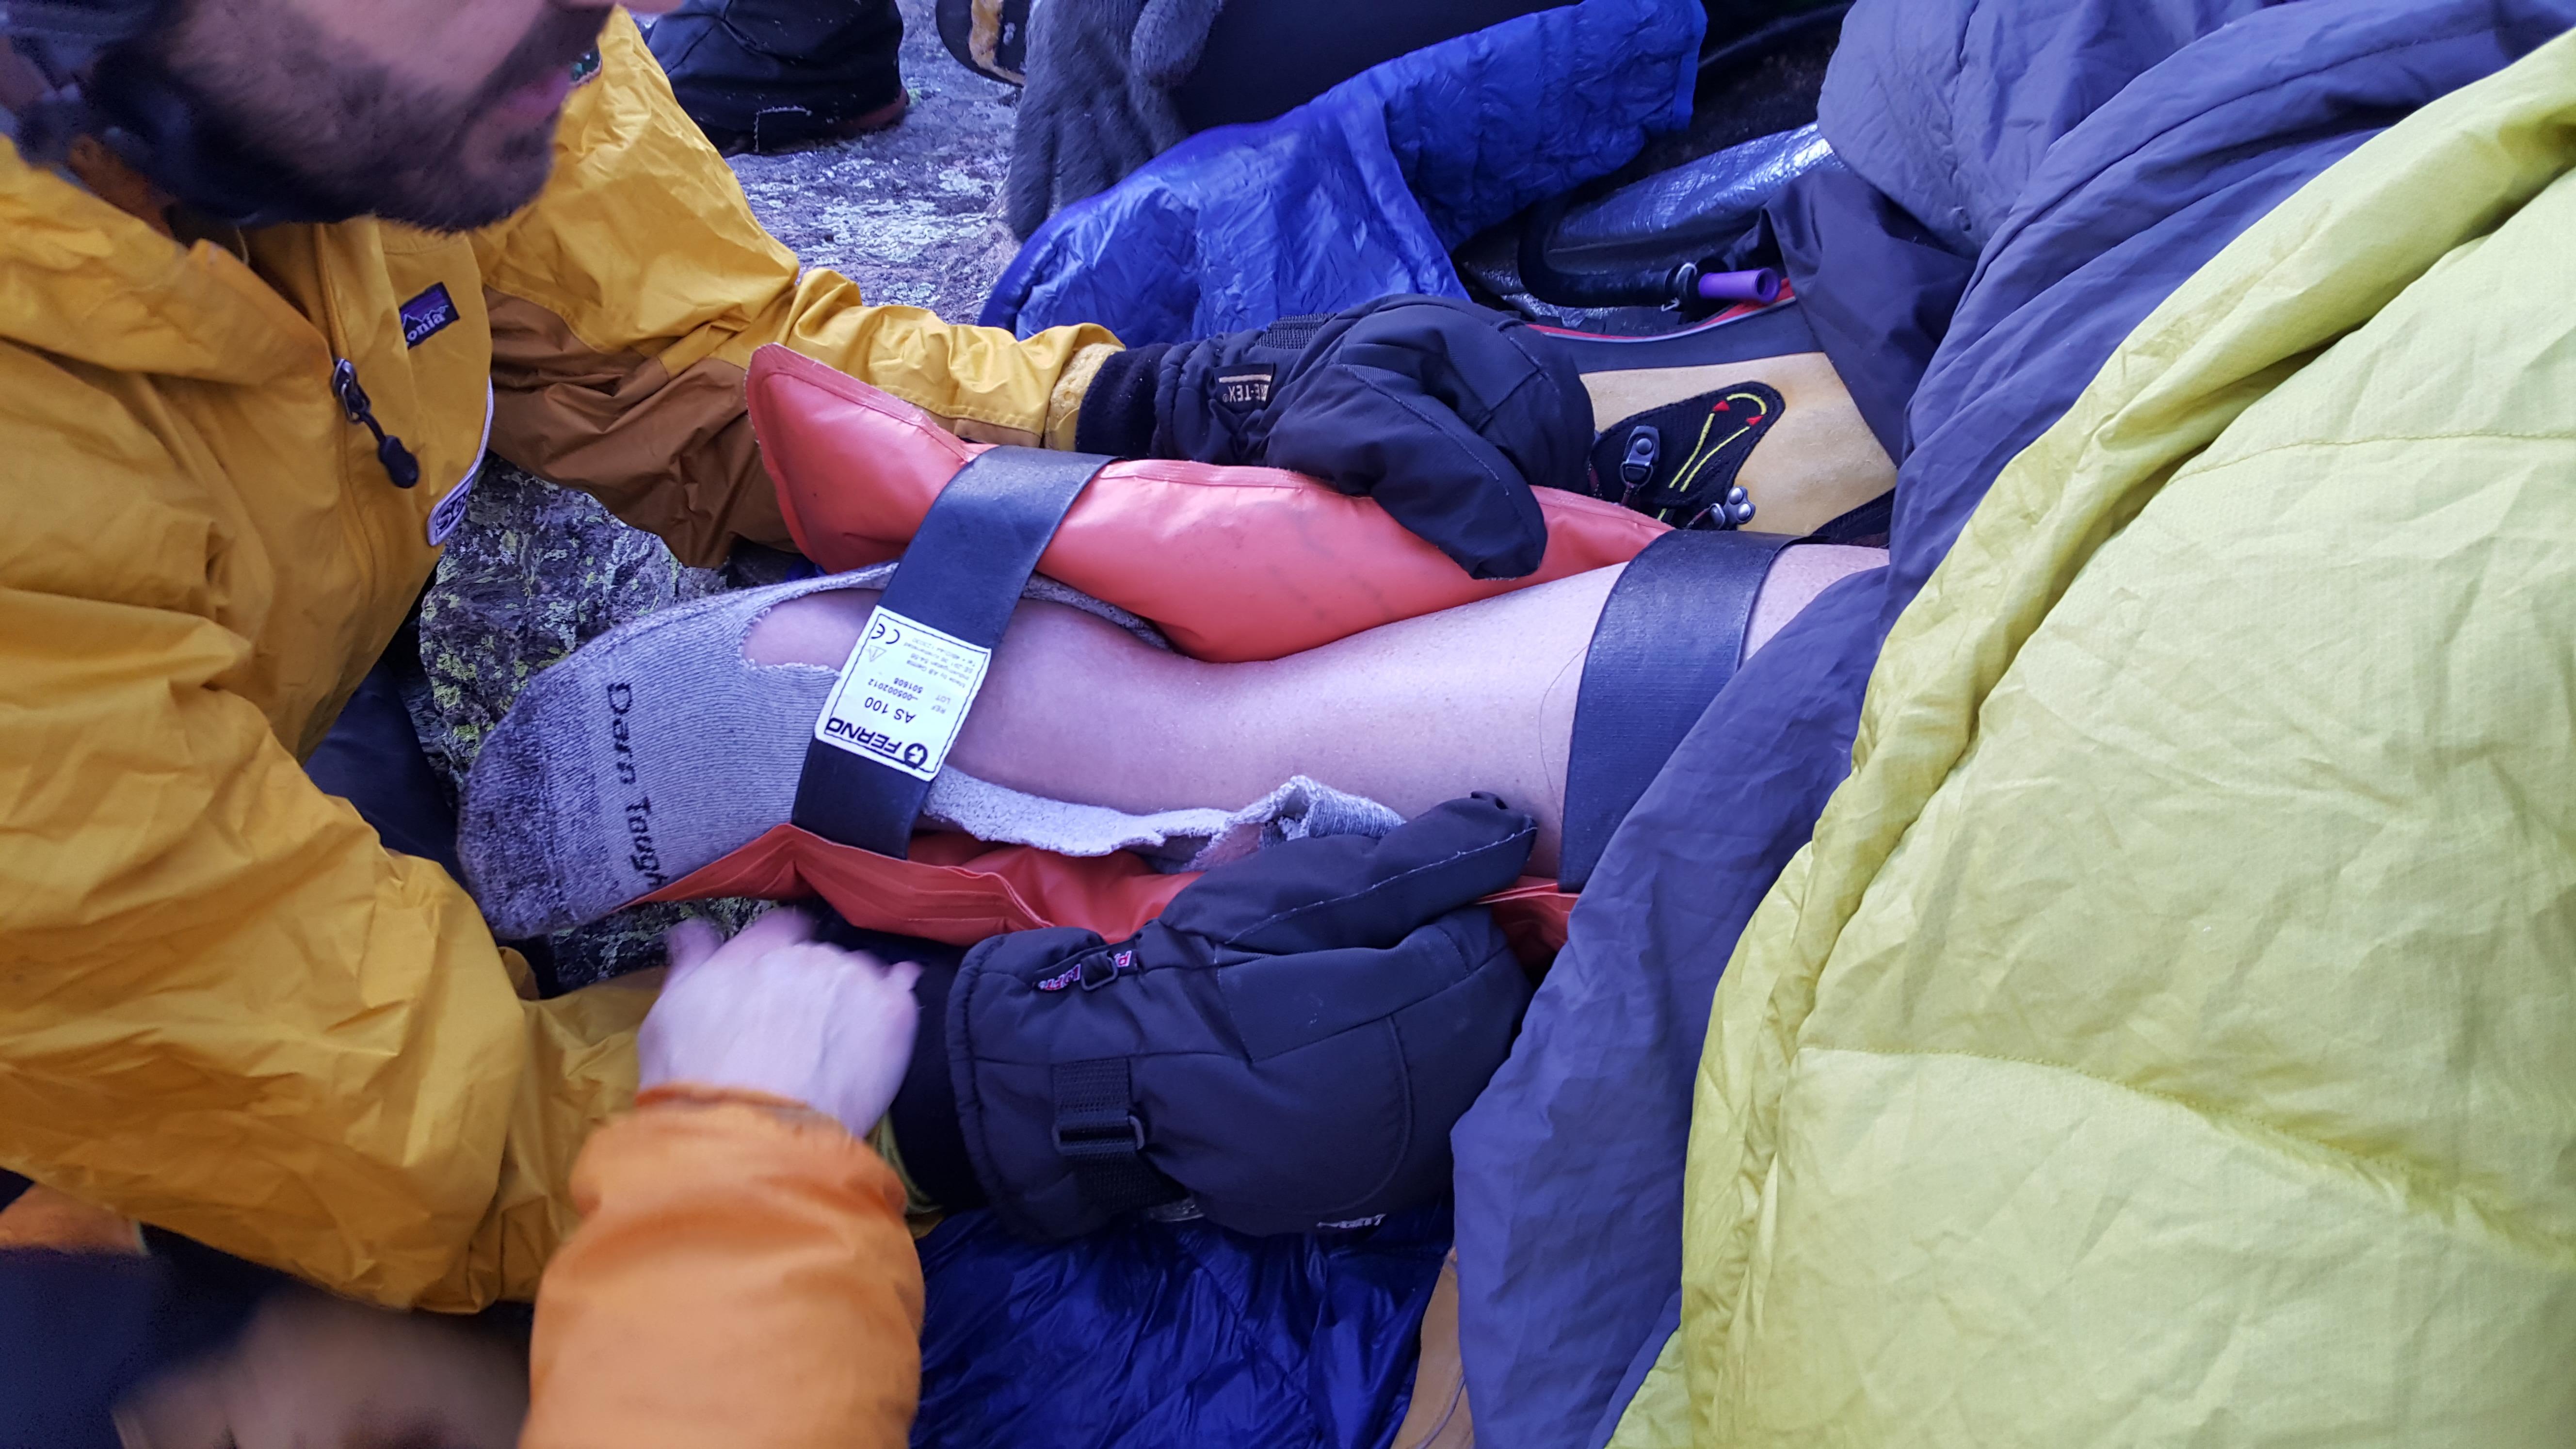 Alan Broken leg picture with splint